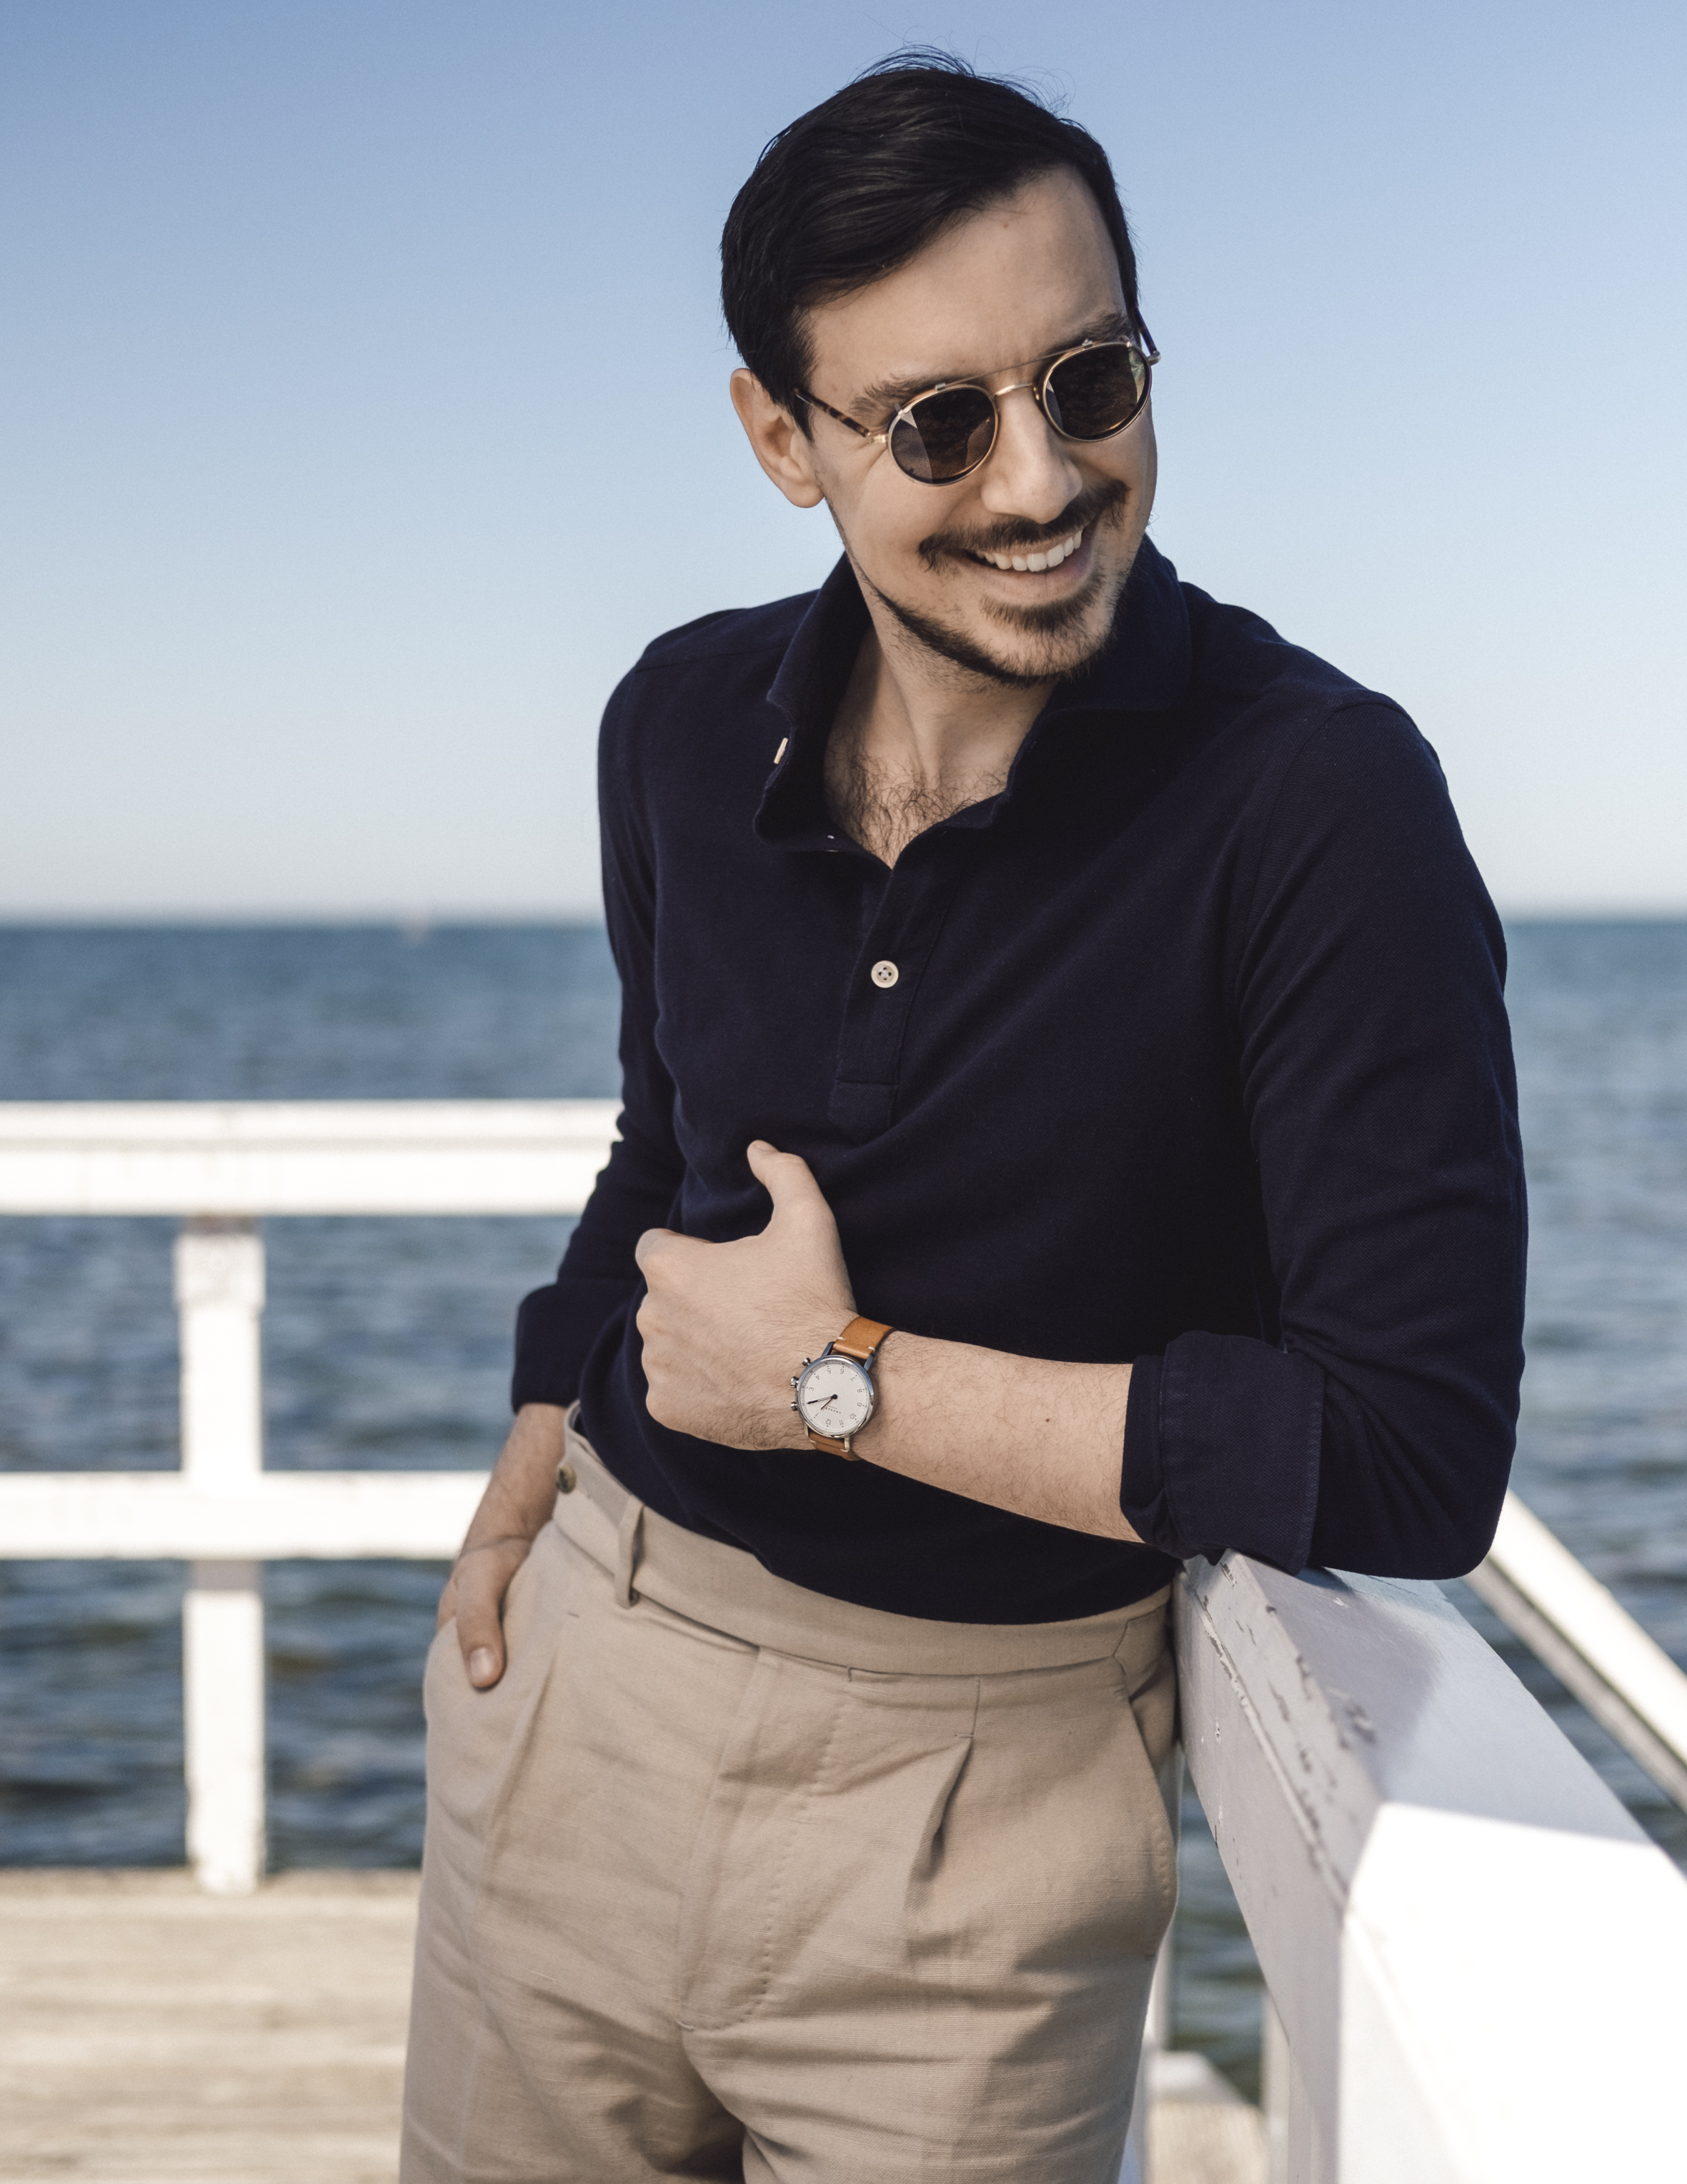 Lookbook: Summer Feeling featuring Kronaby Nord